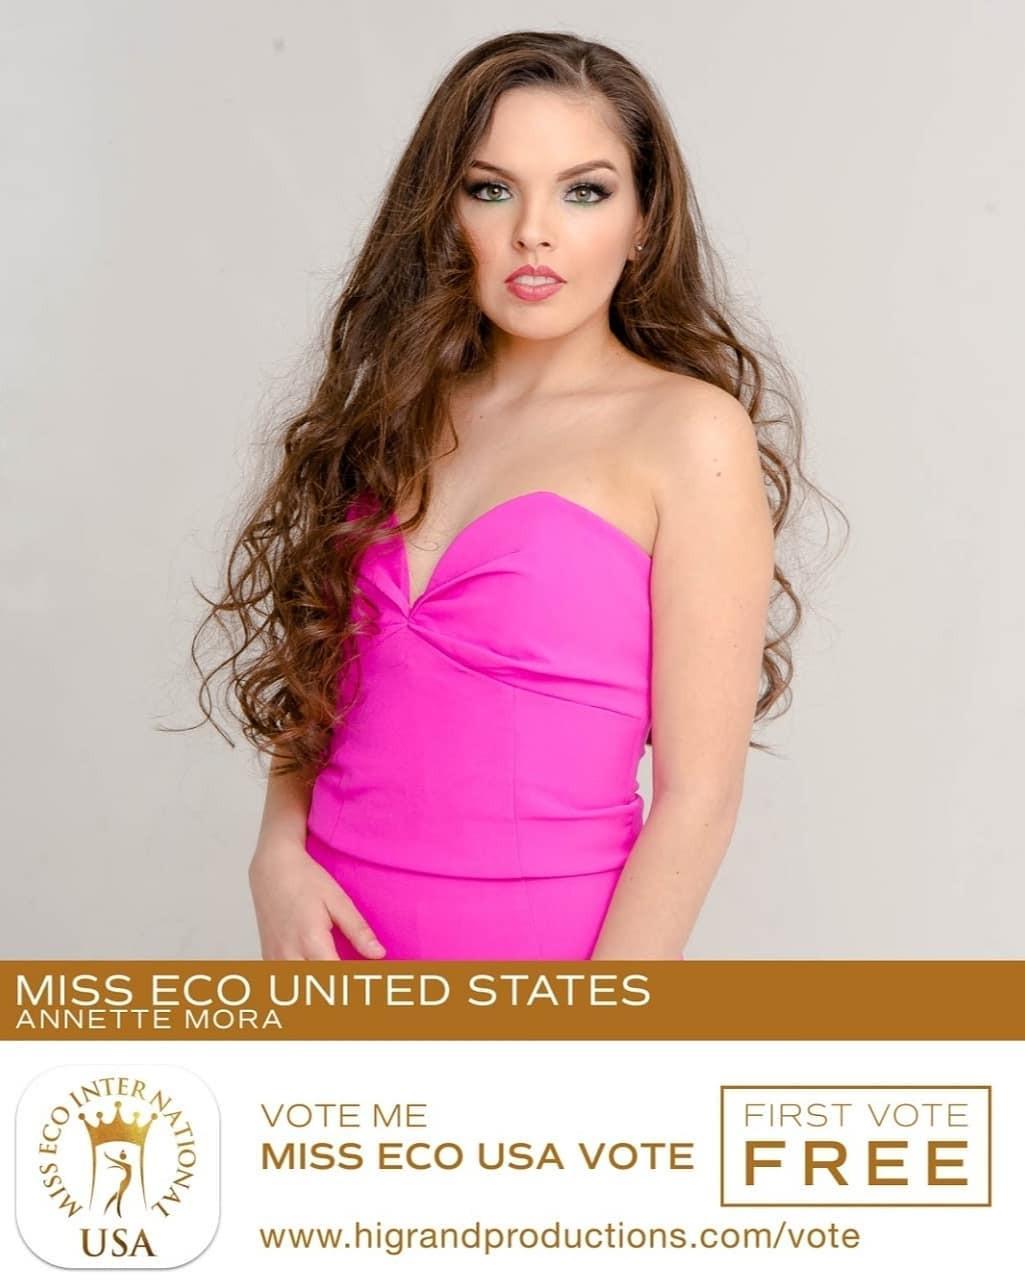 candidatas a miss eco usa 2021. final: 18 june. CJlJMN